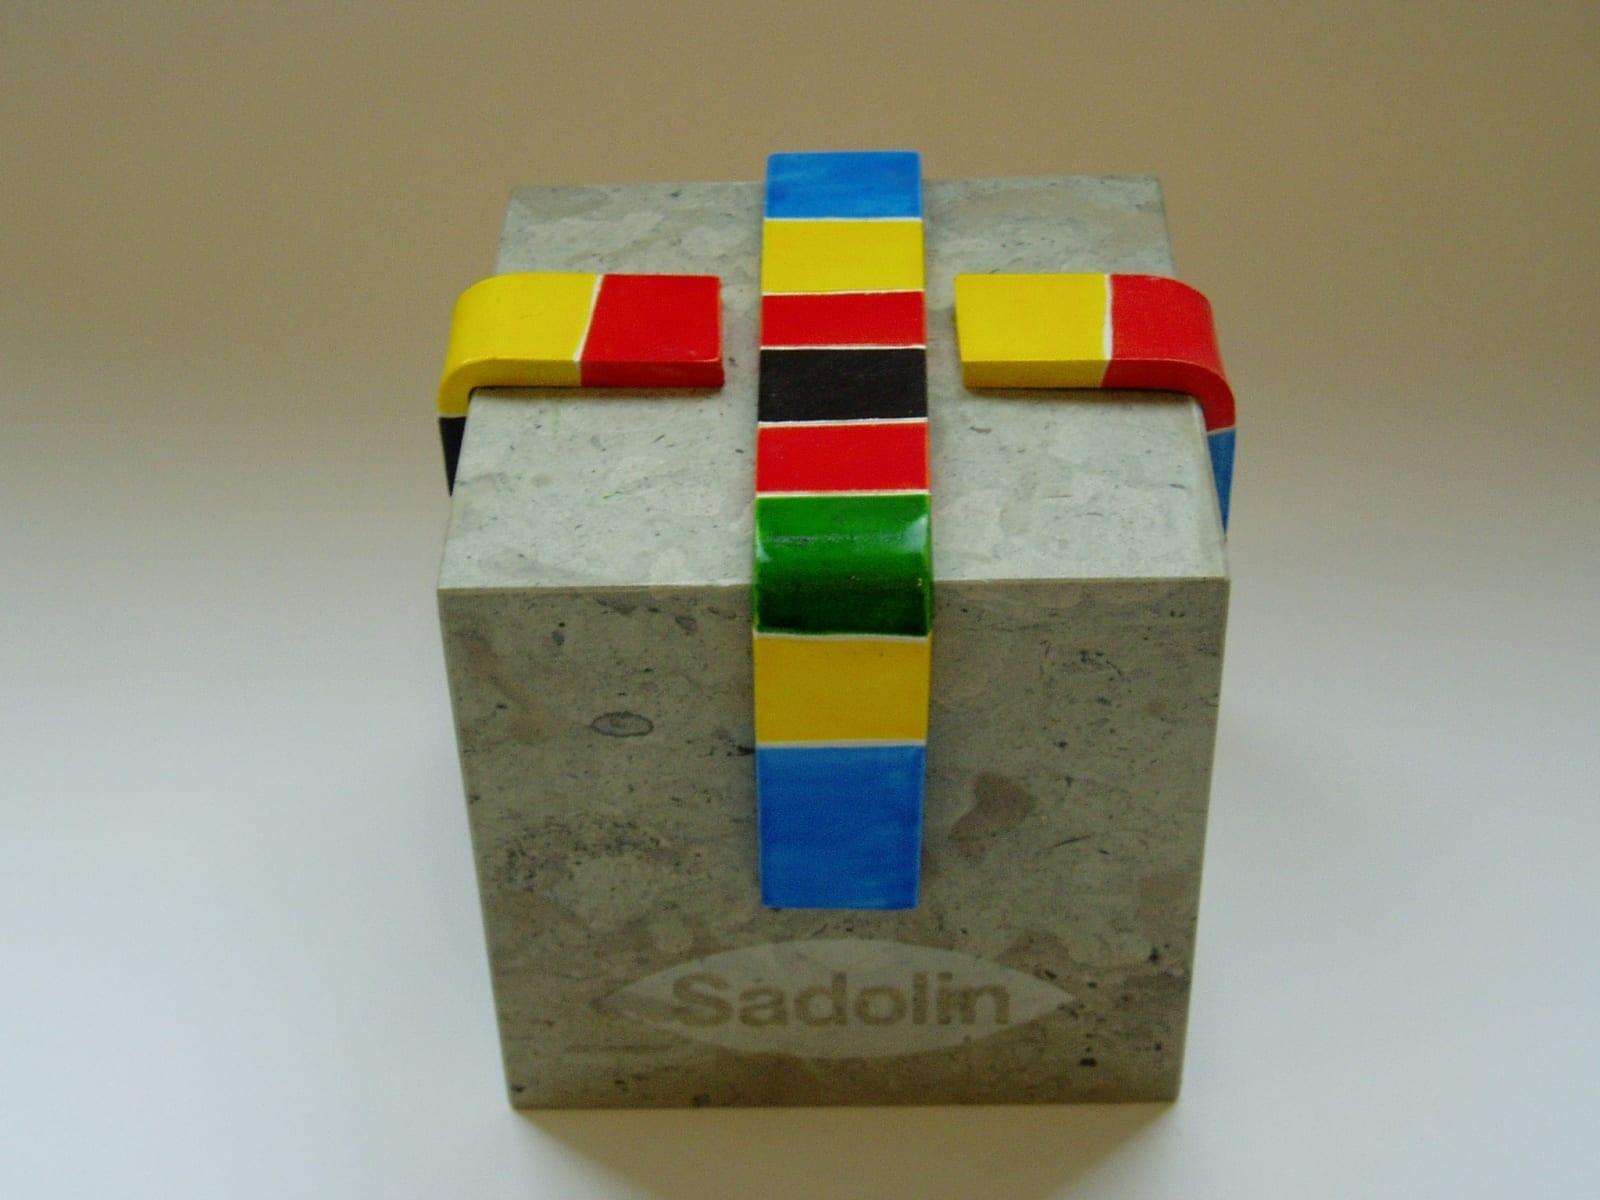 SADOLIN 2000 paekivi, keraamika <br/> For SADOLIN 2000 limestone, ceramic